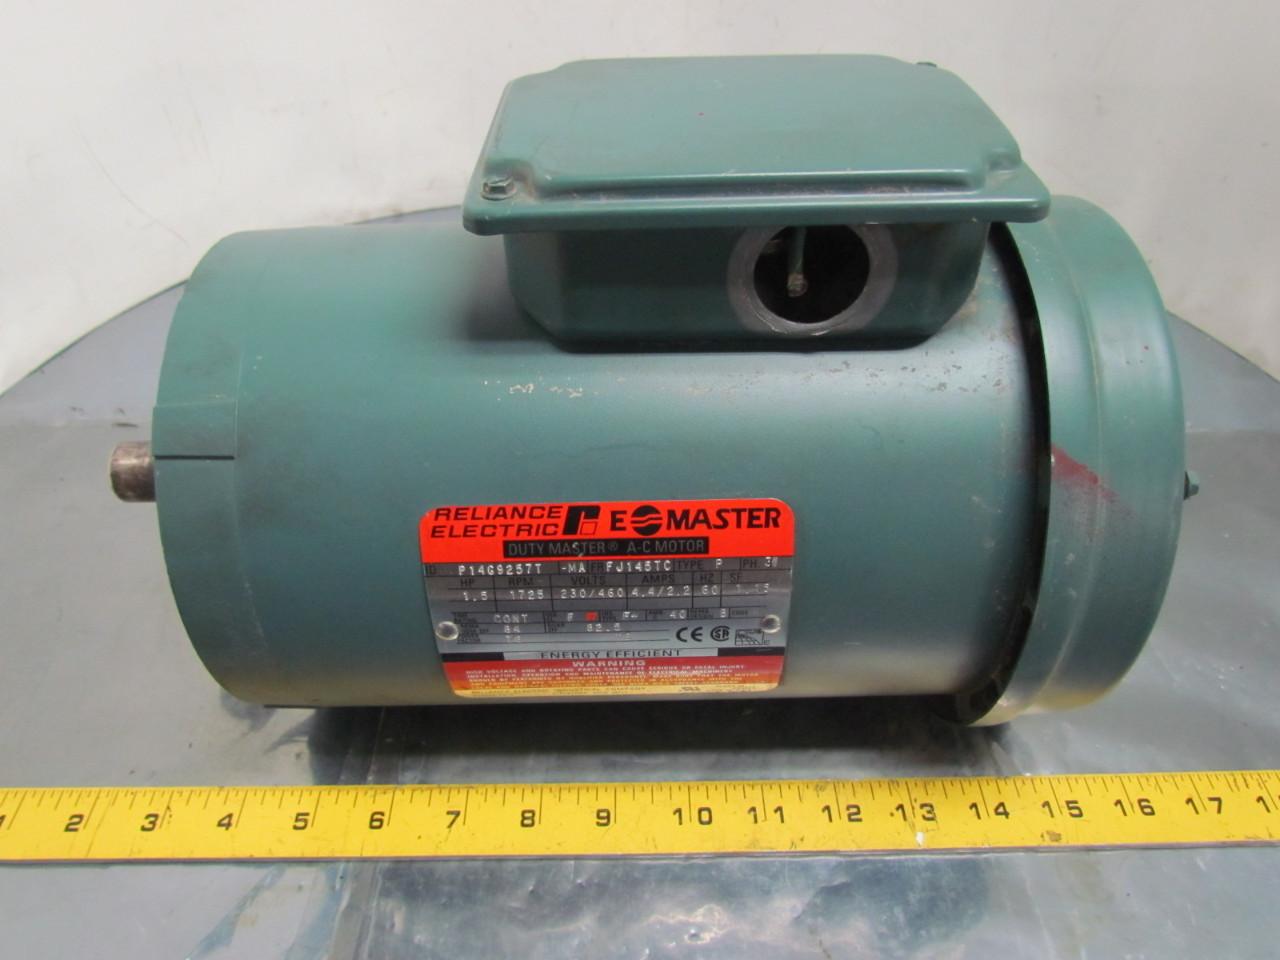 Reliance Electric P14g9257t Motor 1 1 2 Hp 3 Ph 1725rpm